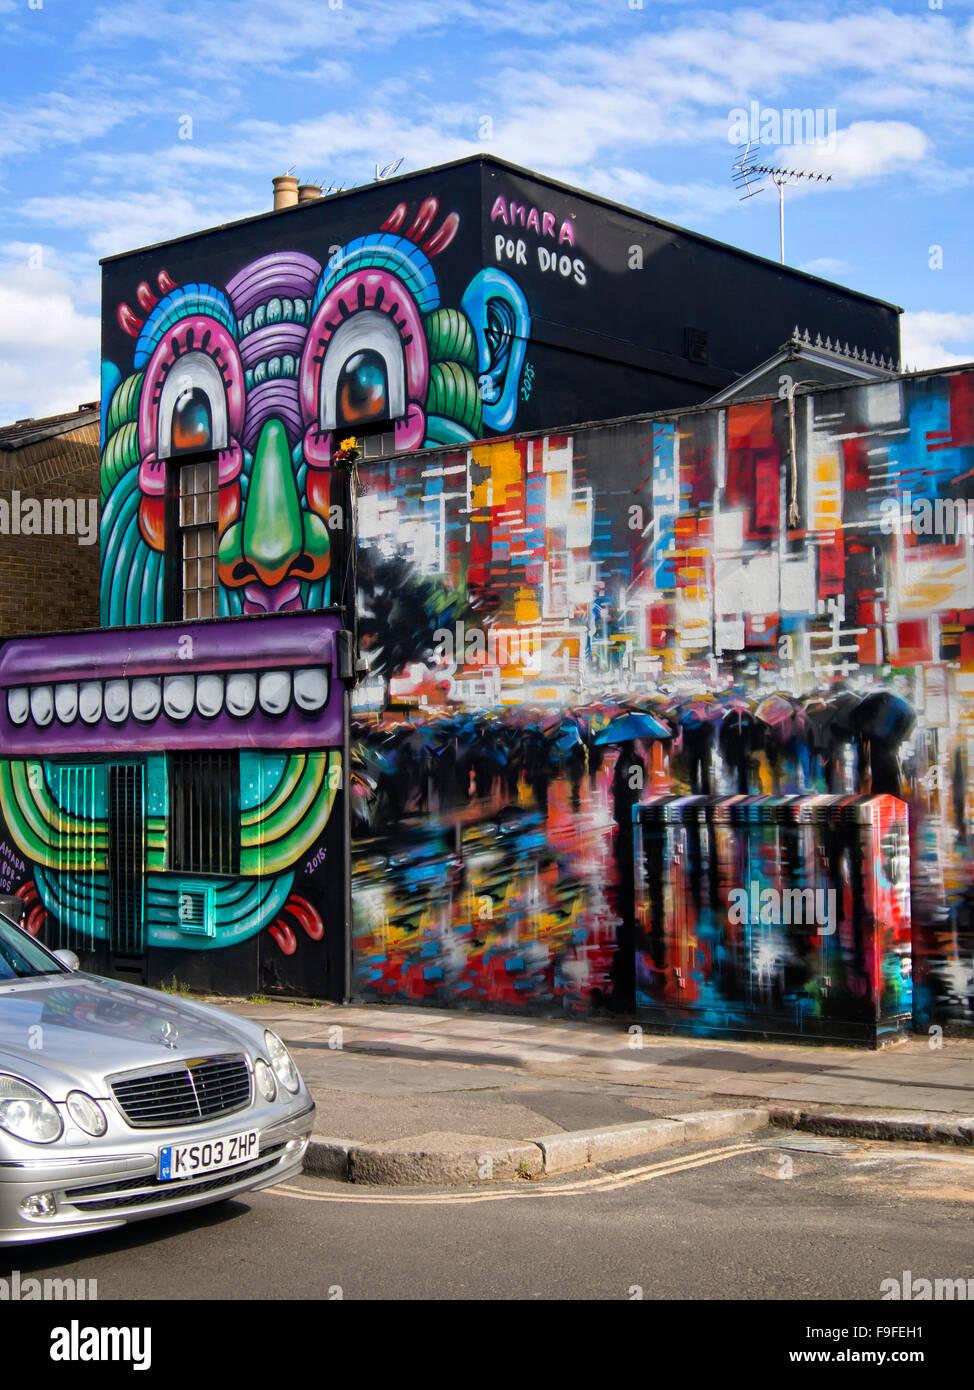 Camden Market Graffiti Stock Photos & Camden Market Graffiti Stock on